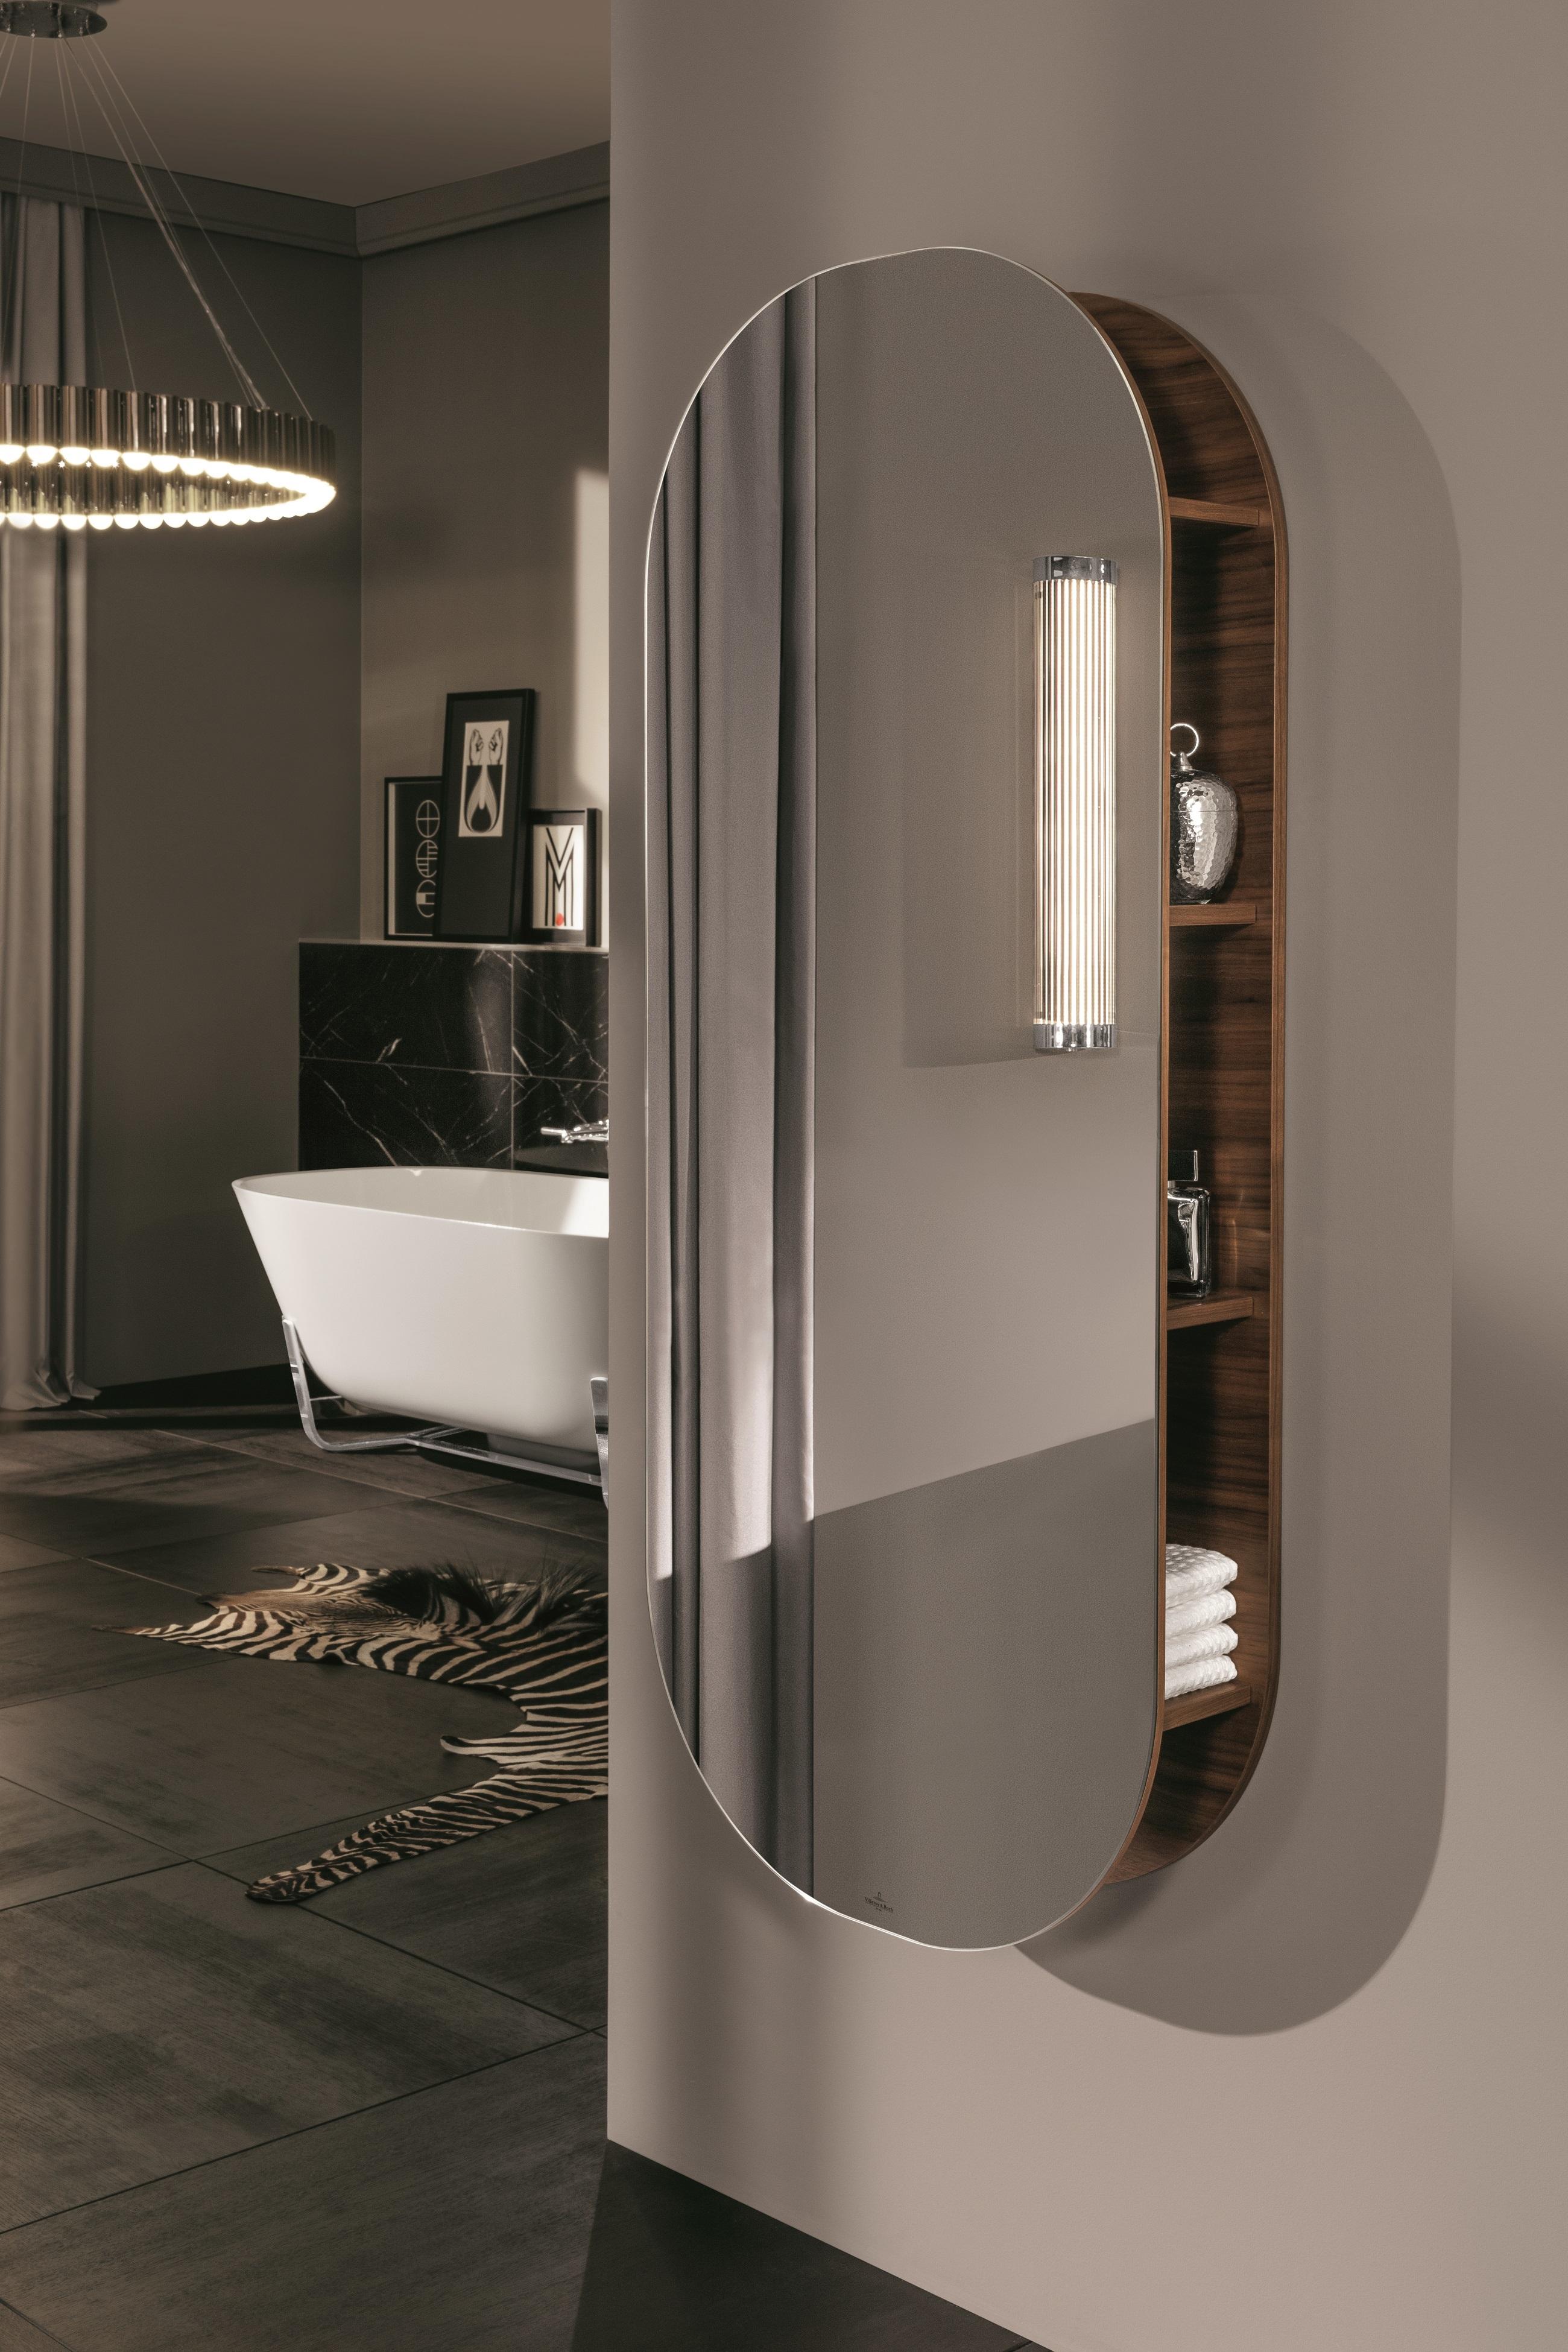 Bathroom furniture antheus by villeroy boch bath wellness stylepark for Villeroy and boch bathroom accessories